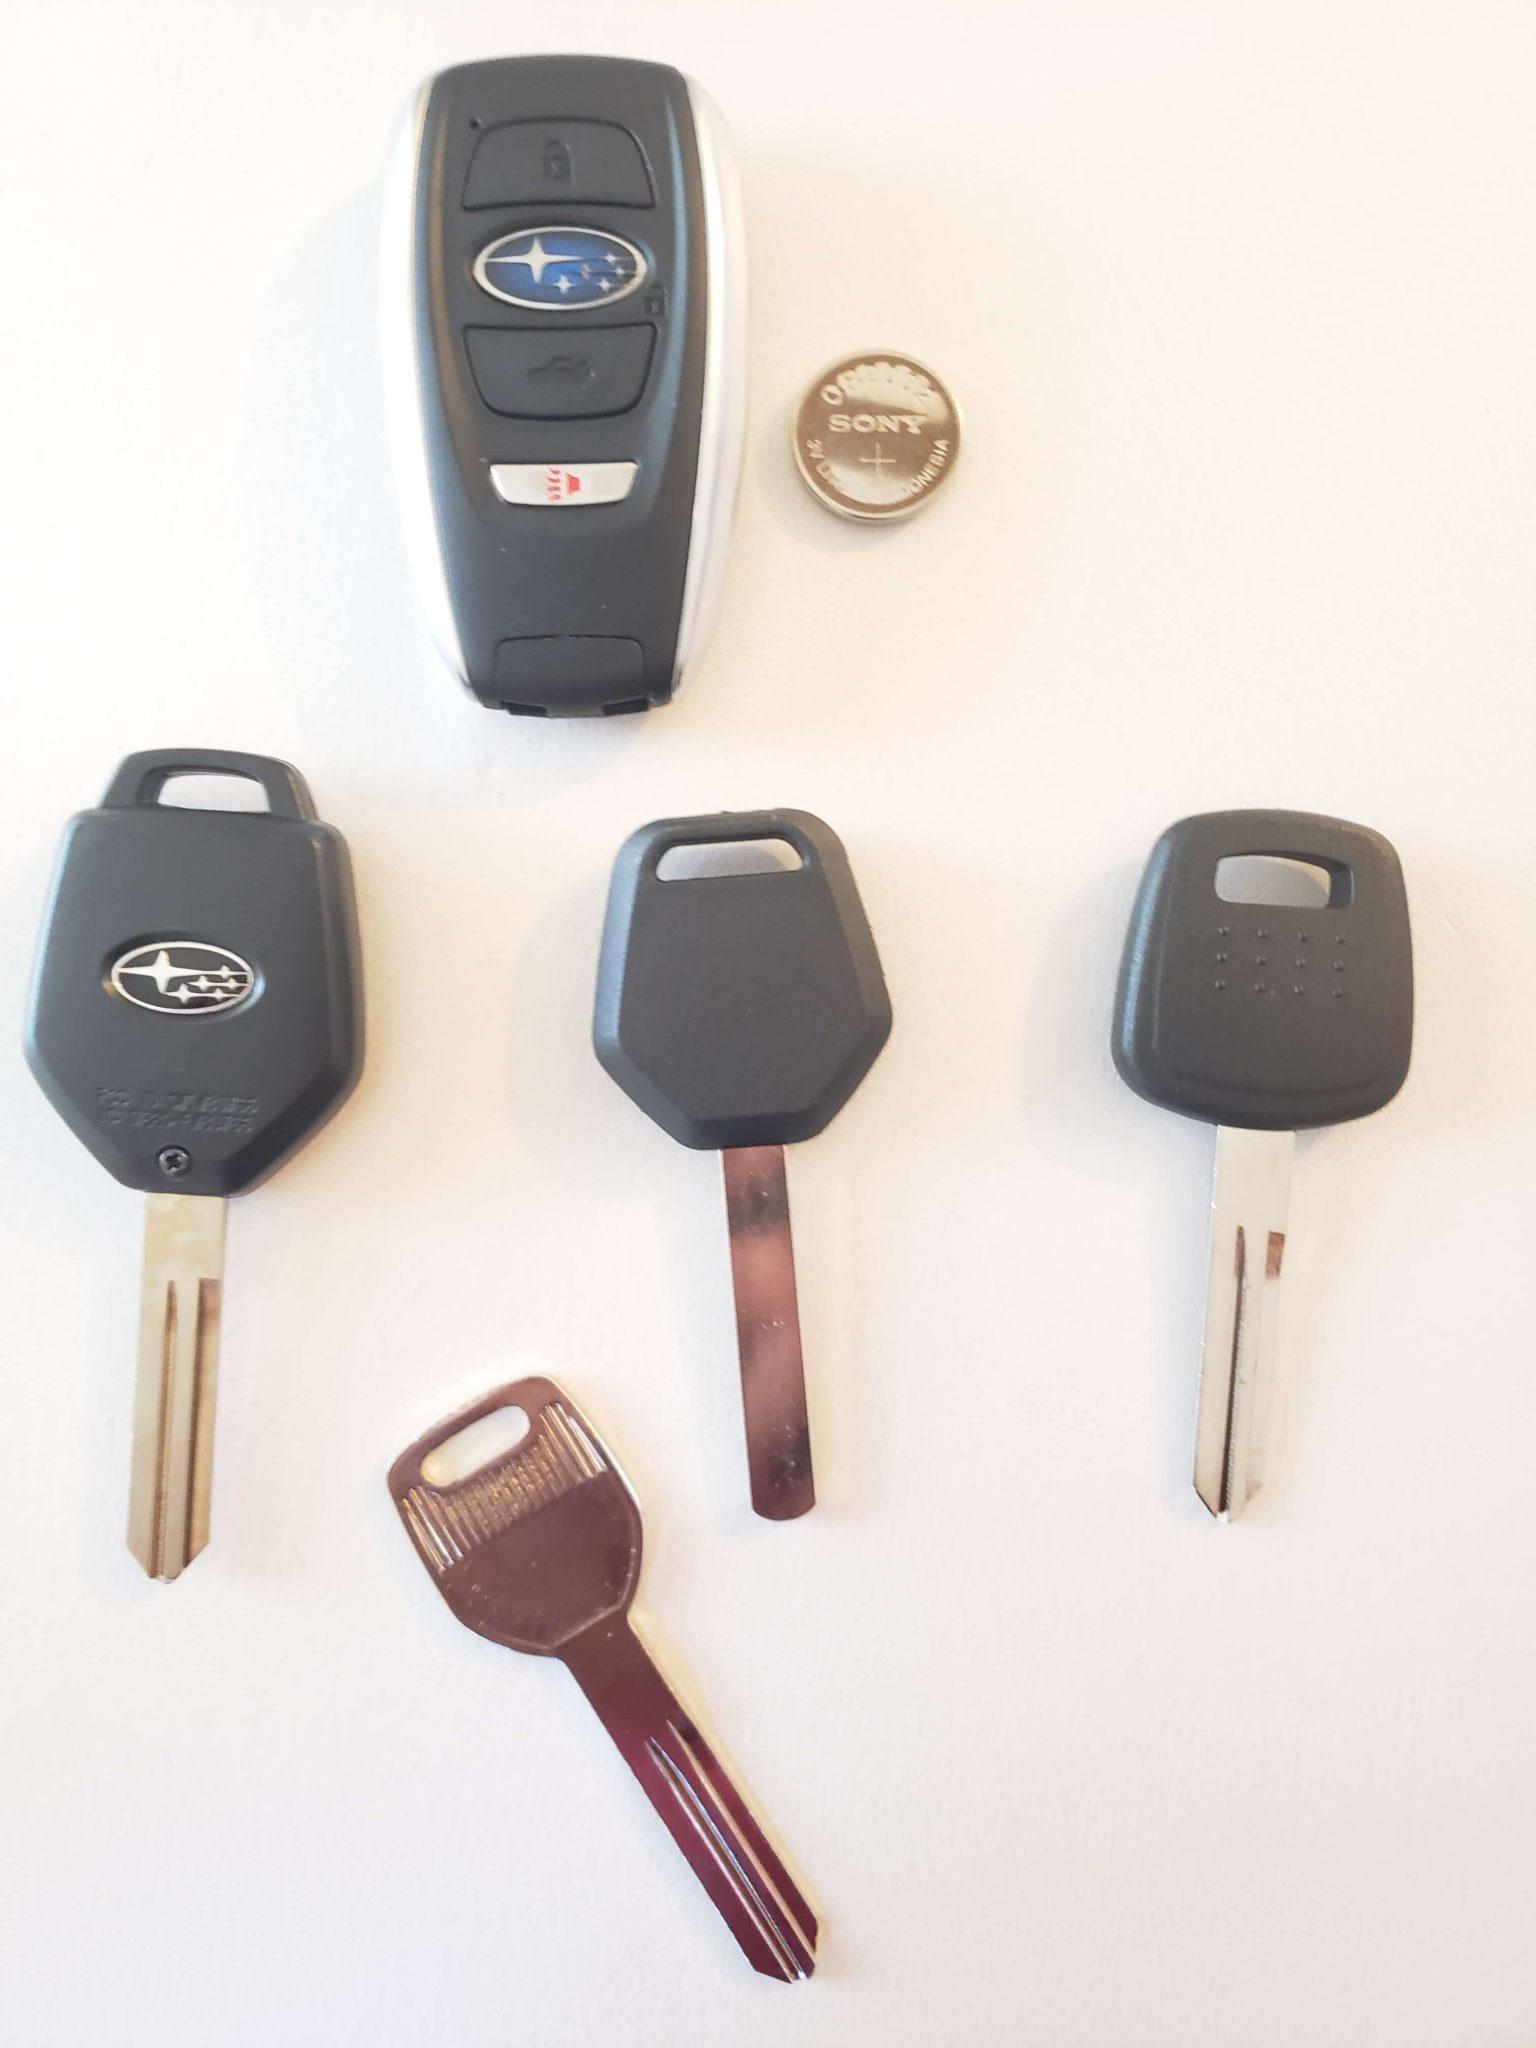 Subaru Replacement Key >> Lost Subaru Keys Replacement All Subaru Car Keys Made On